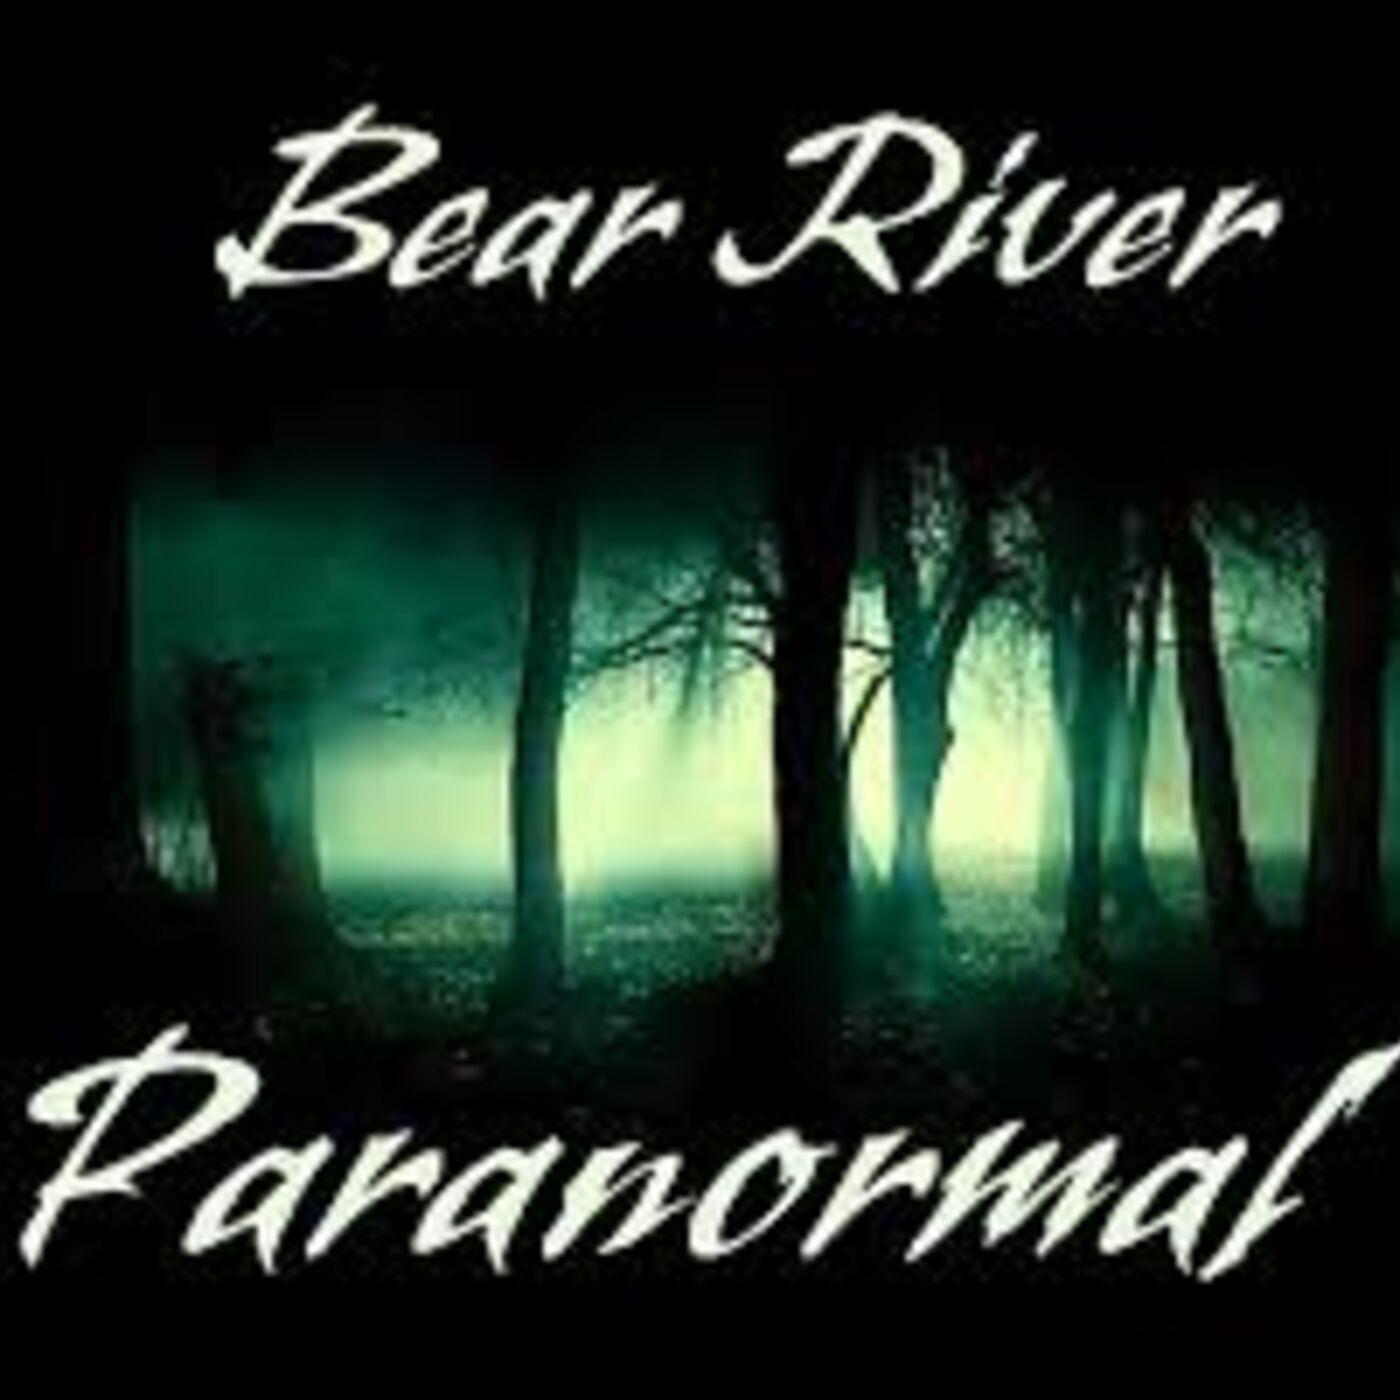 Episode 35 - Bear River Paranormal